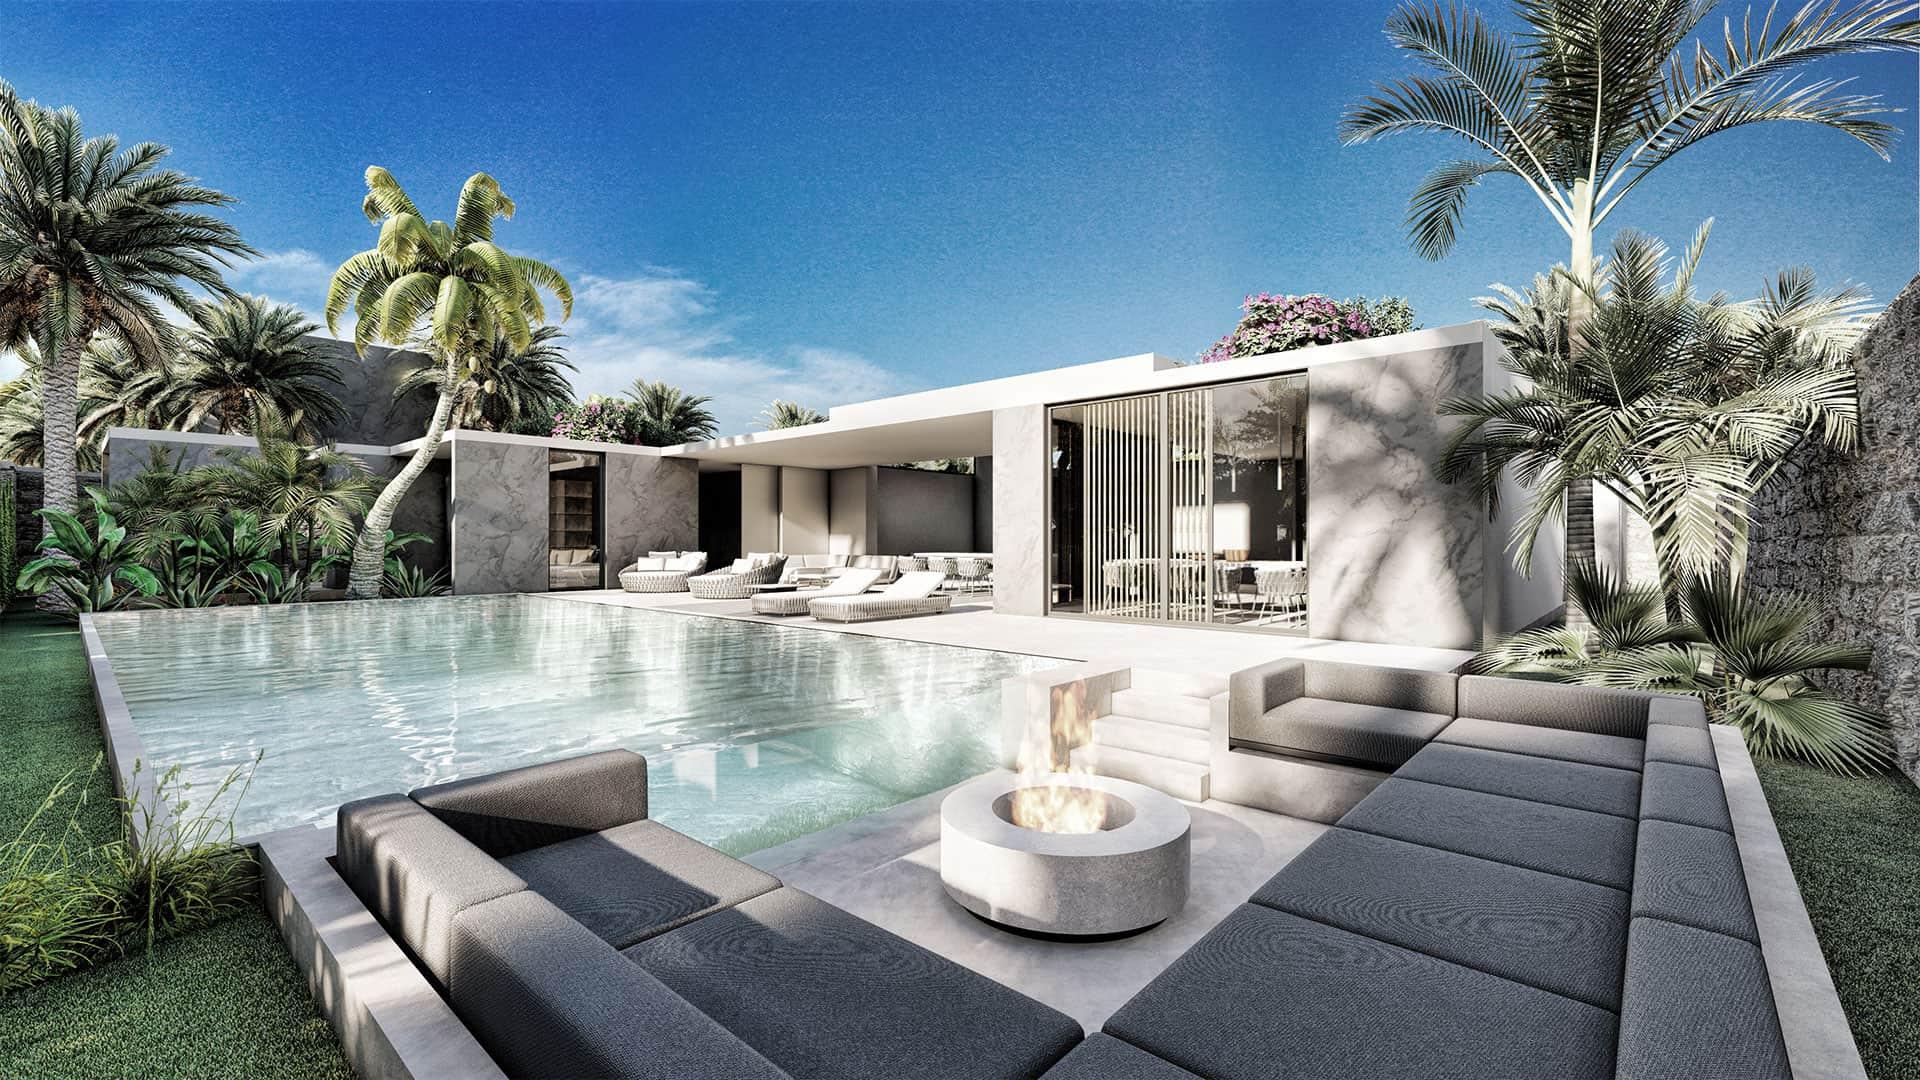 MIRARI - Huit villas d'exception||||MIRARI